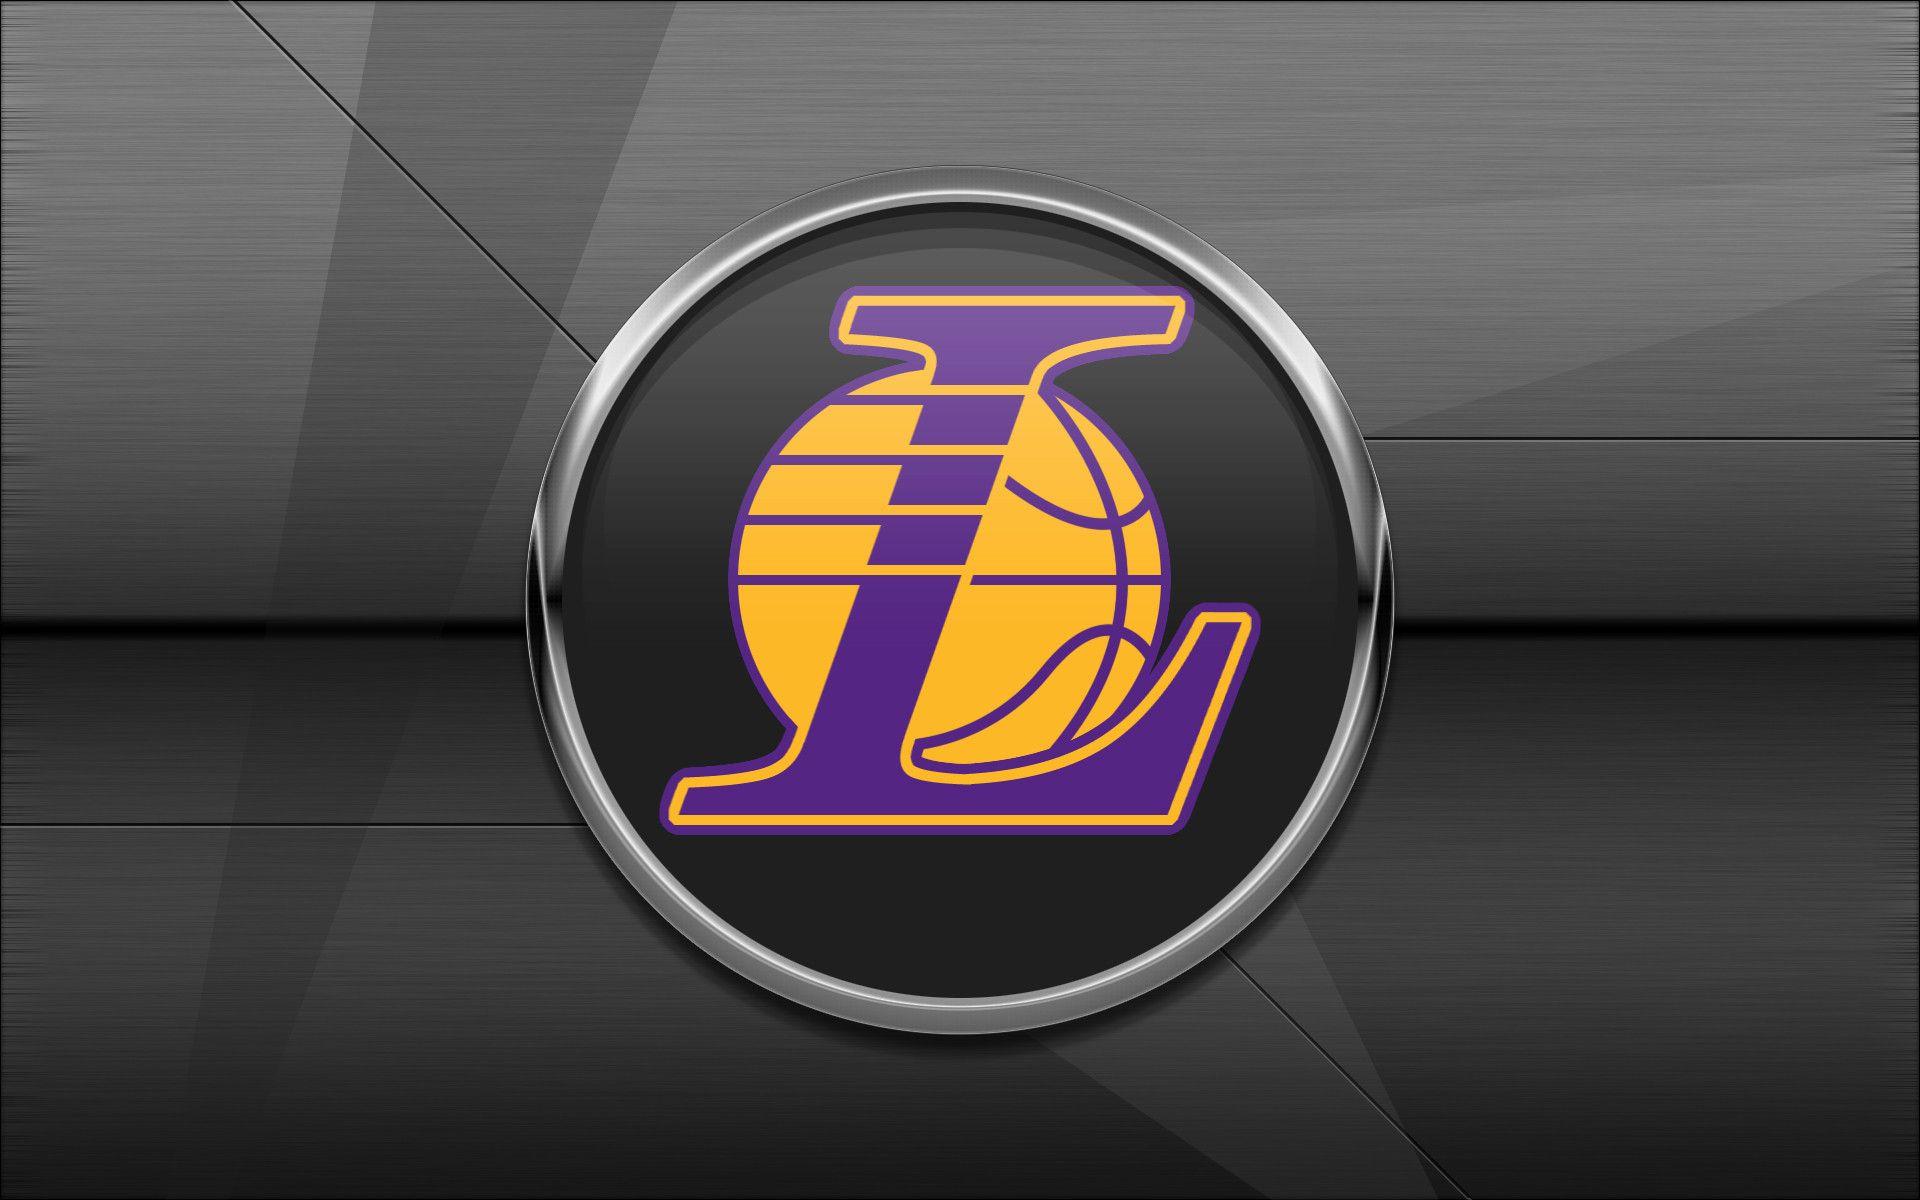 Los Angeles Lakers Grey Hd Background Desktop Wallpapers Widescreen Lakers Logo Logo Background Lakers Wallpaper